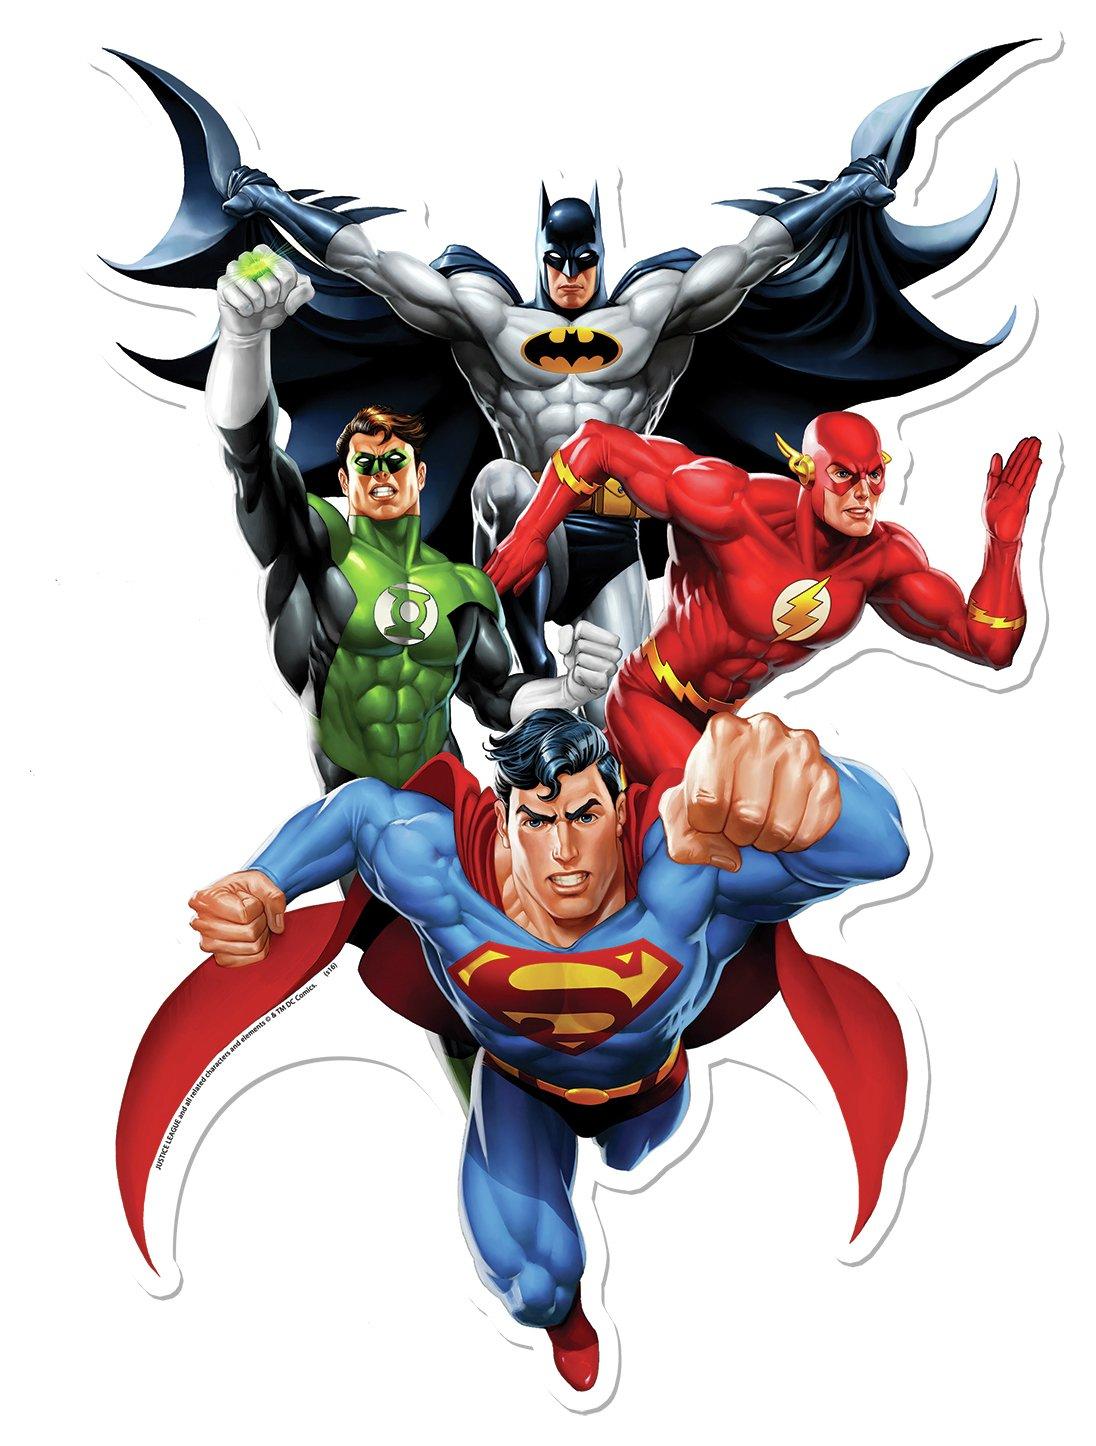 Image of DC Comics Star Cutouts Justic League Heroes